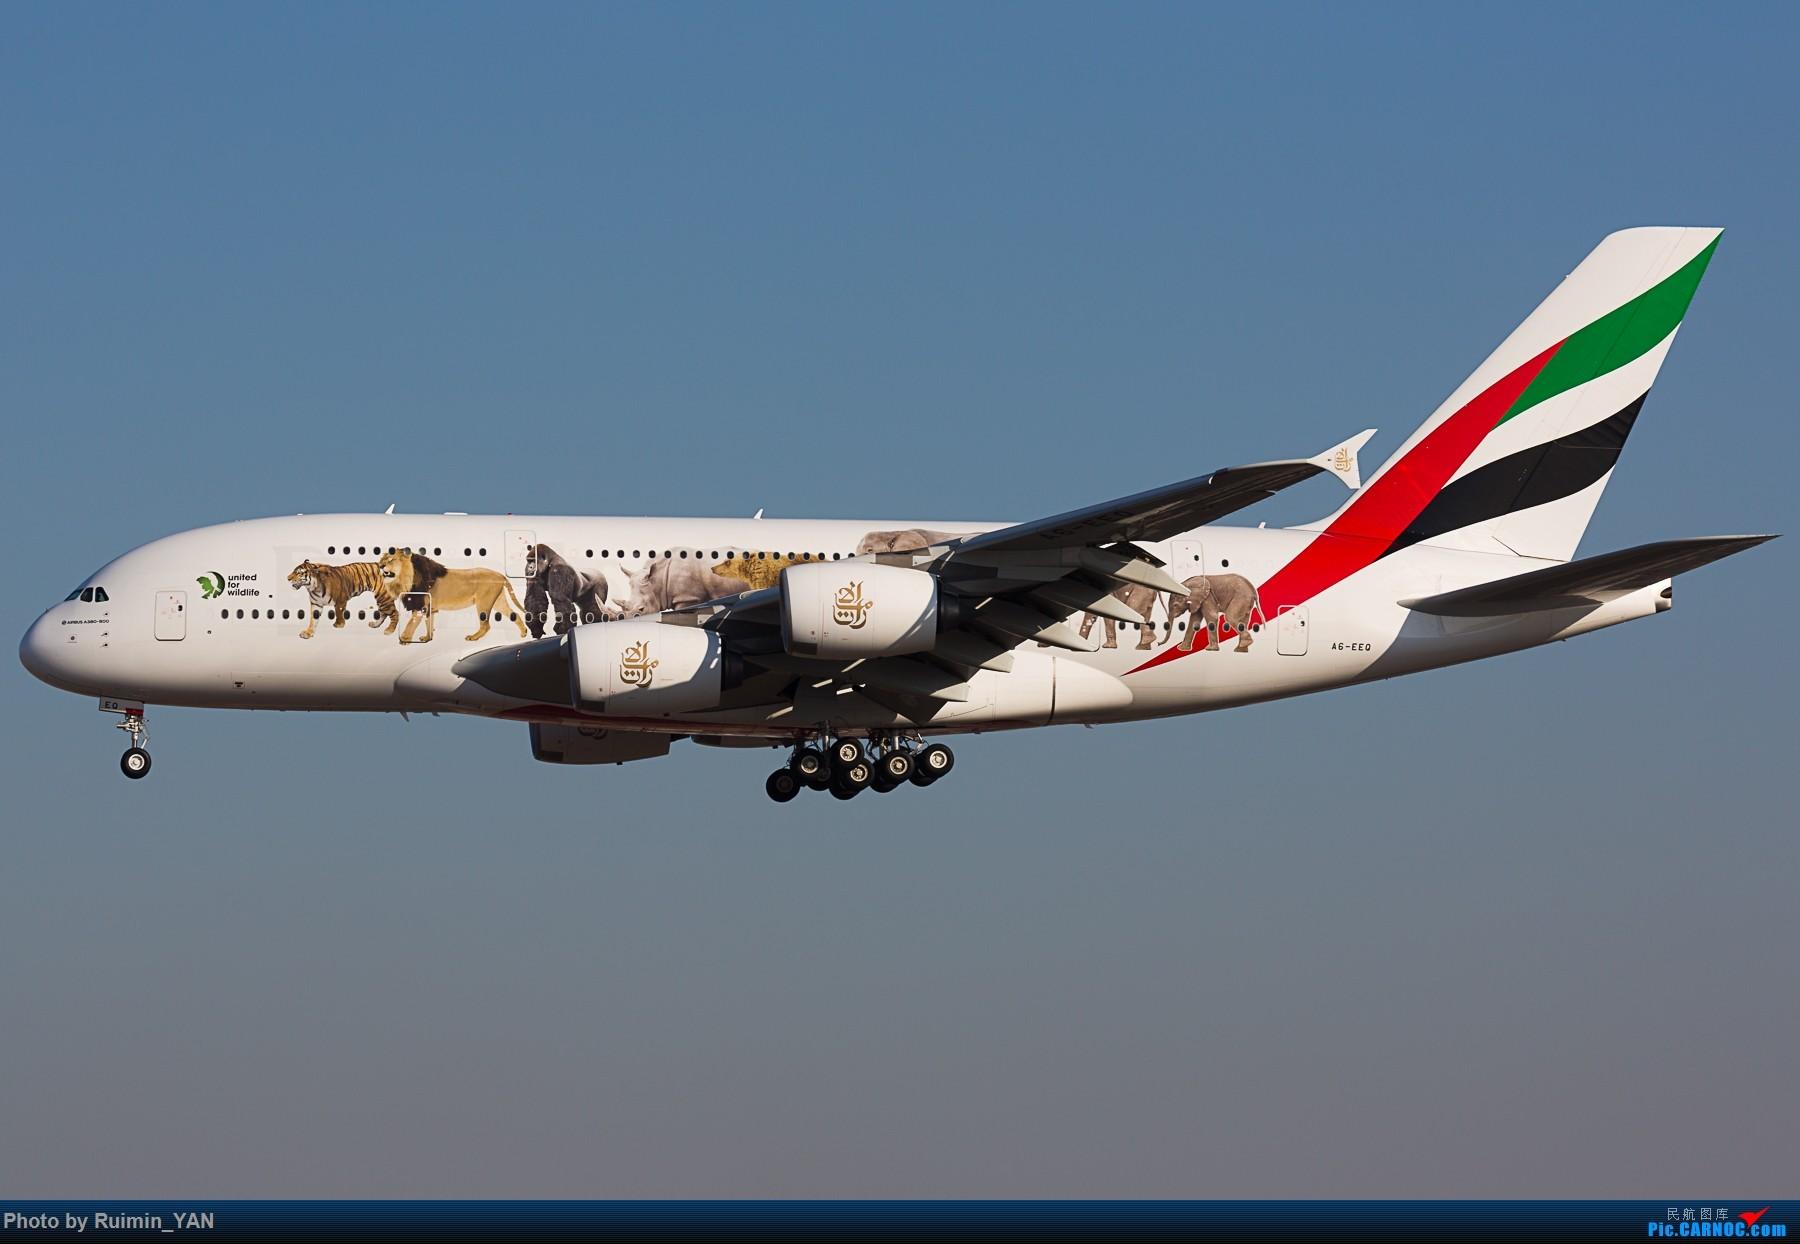 Re:[原创]【PEK】【彩绘】阿联酋航空保护野生动物No.3(EK,Emirates,United For Wildlife) AIRBUS A380-800 A6-EEQ 中国北京首都国际机场